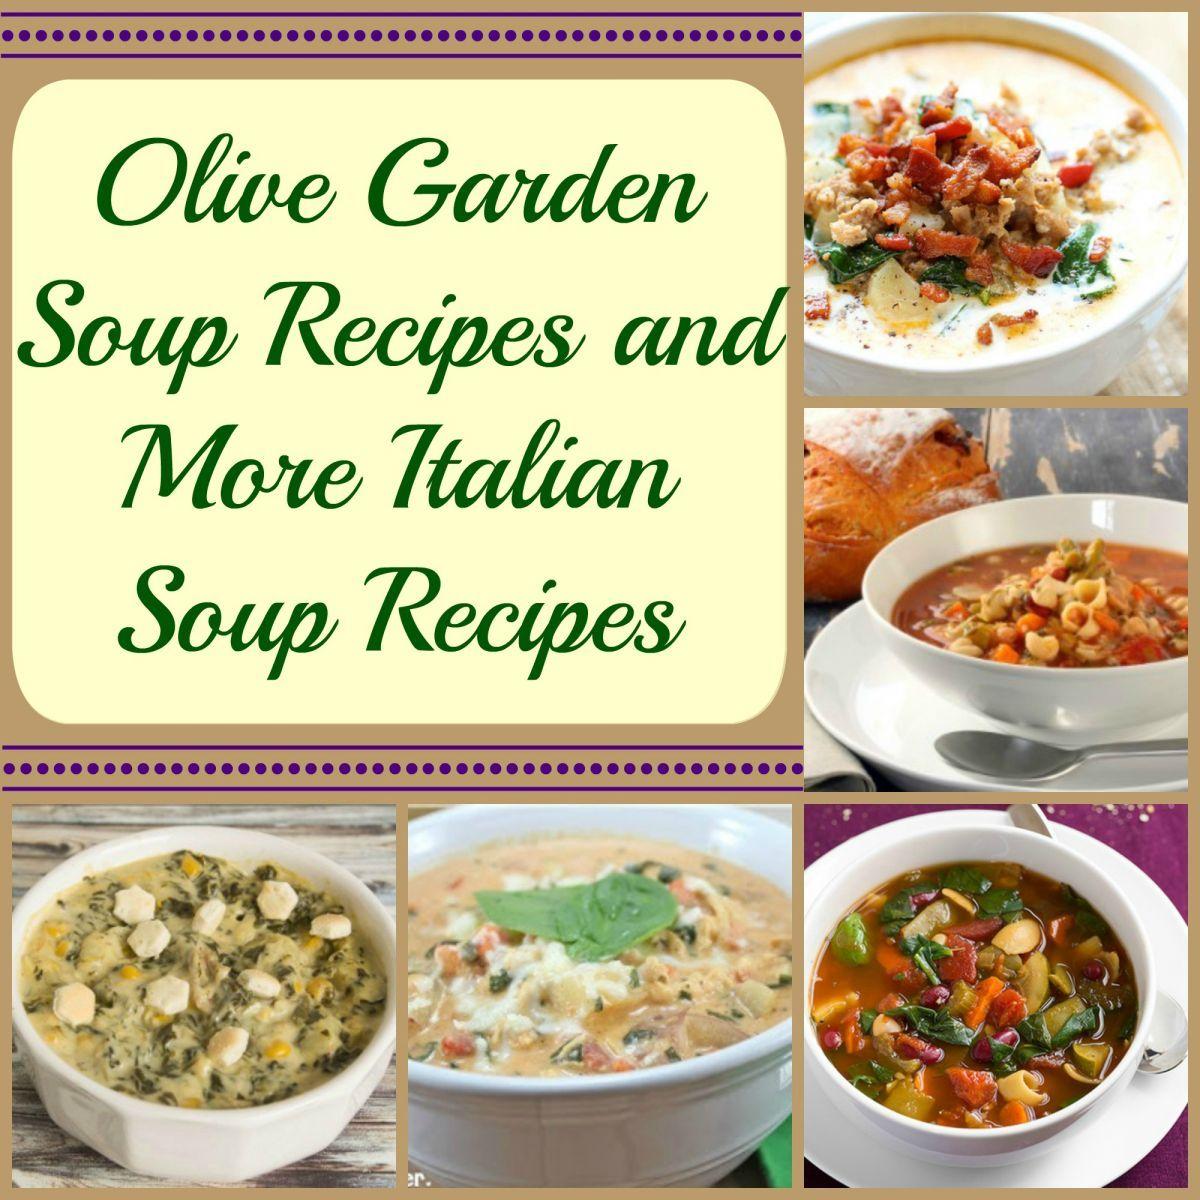 8 Olive Garden Soup Recipes Italian Recipes Olive Garden Soups Recipes